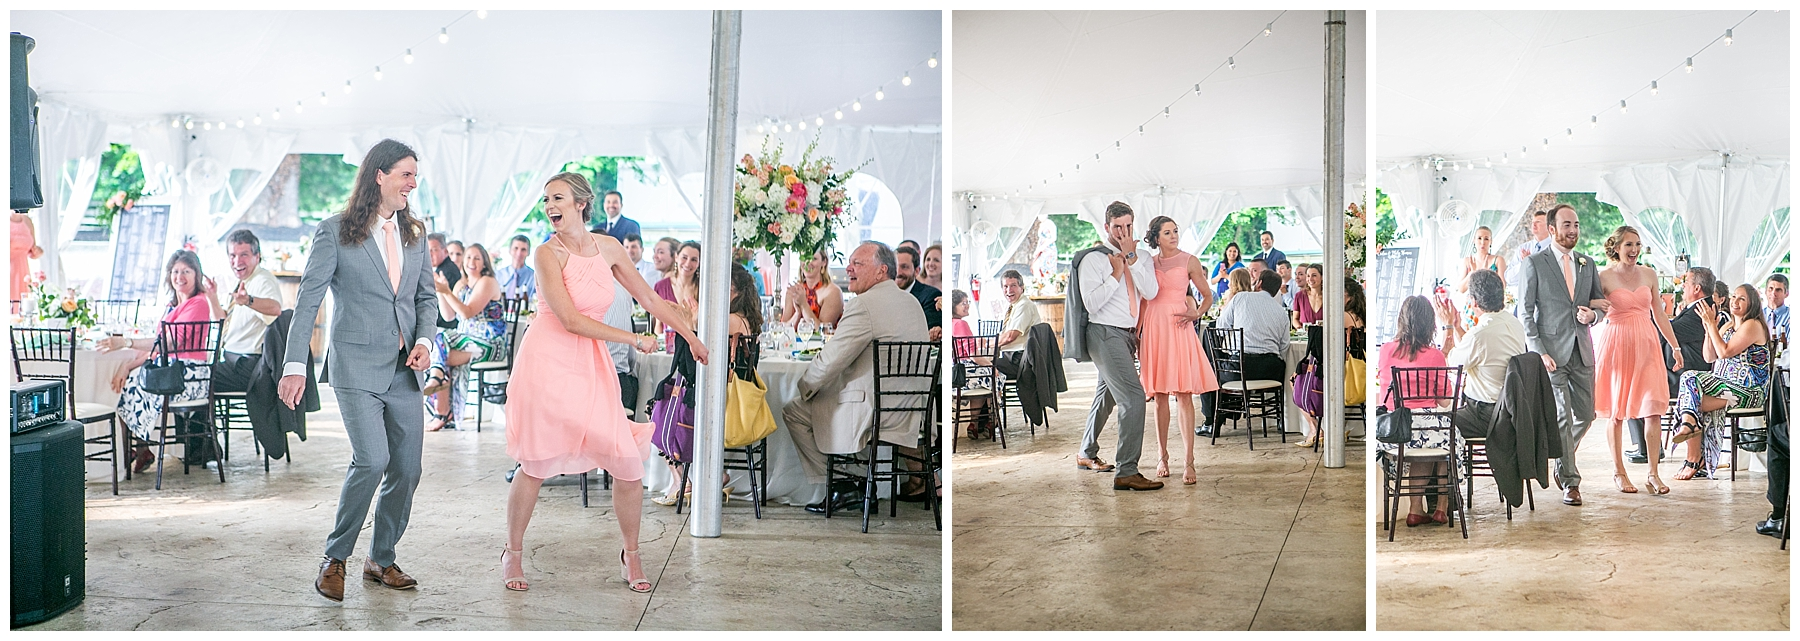 Chelsea Phil Bohemia River Overlook Wedding Living Radiant Photography photos_0126.jpg